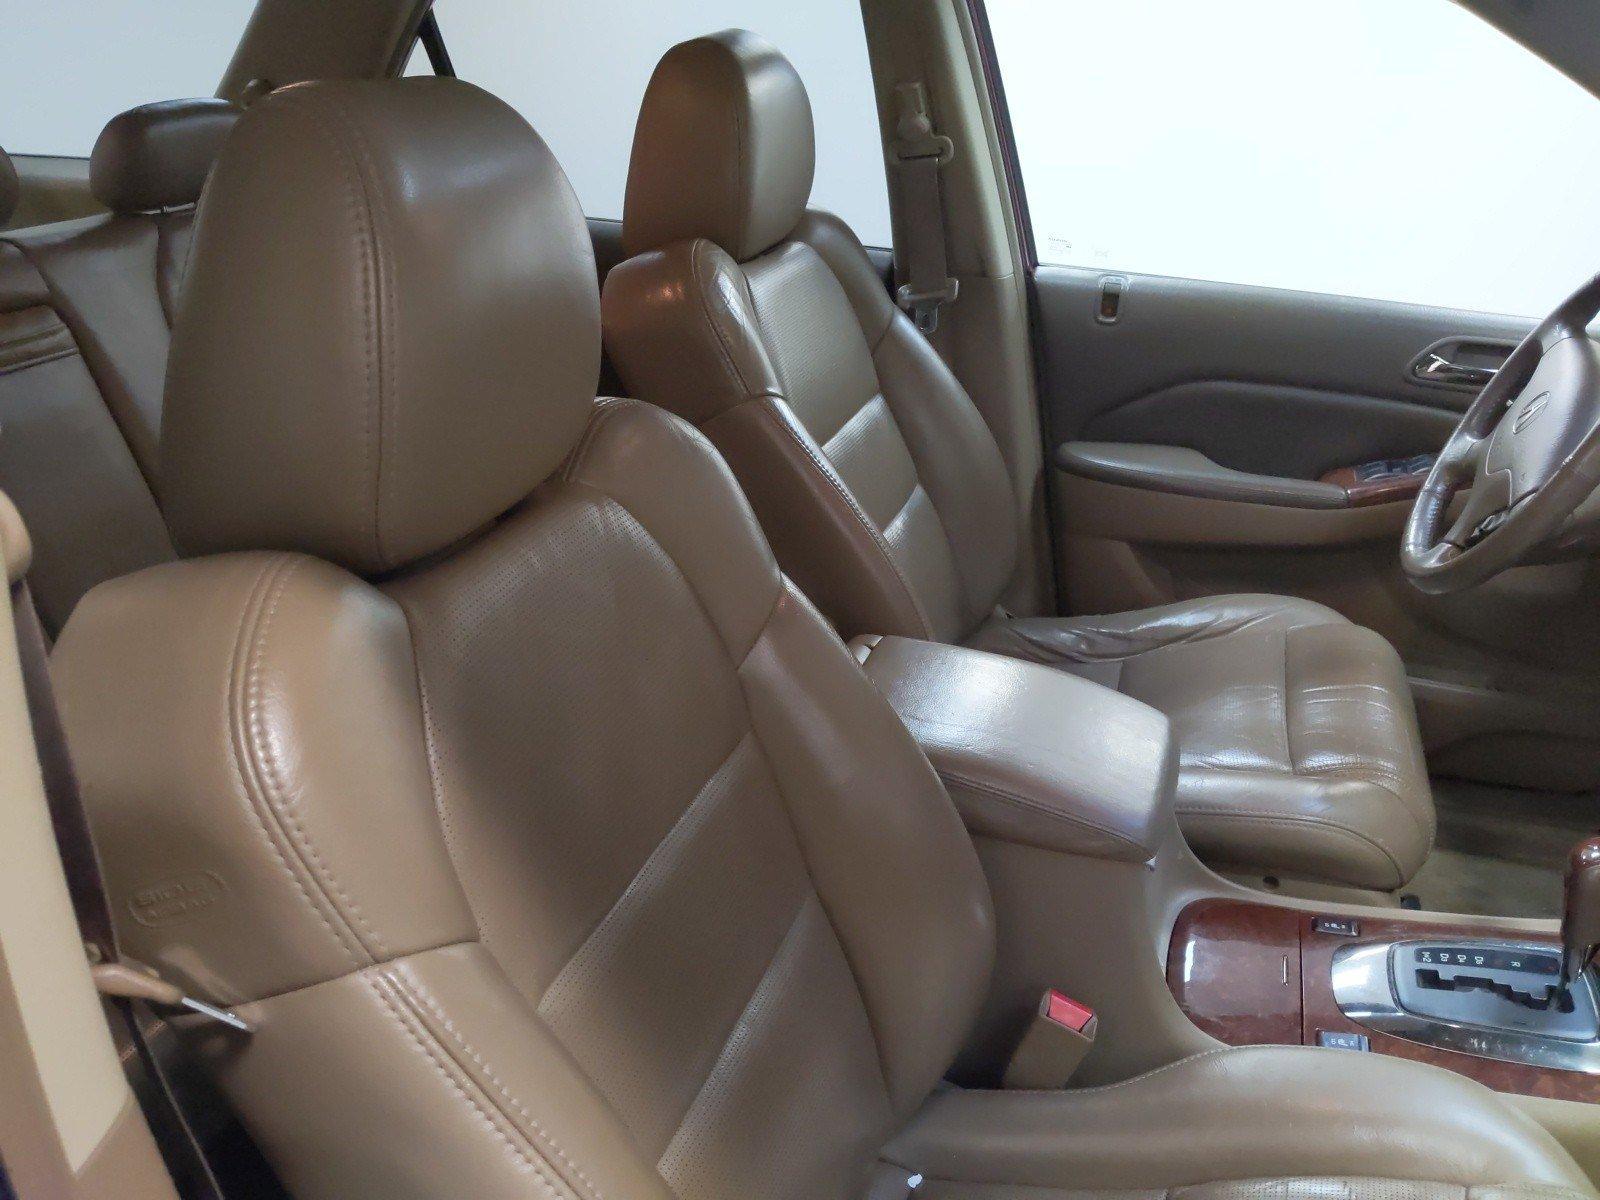 Used 2006 Acura MDX 3.5L Sport Utility for sale in Grand Island NE